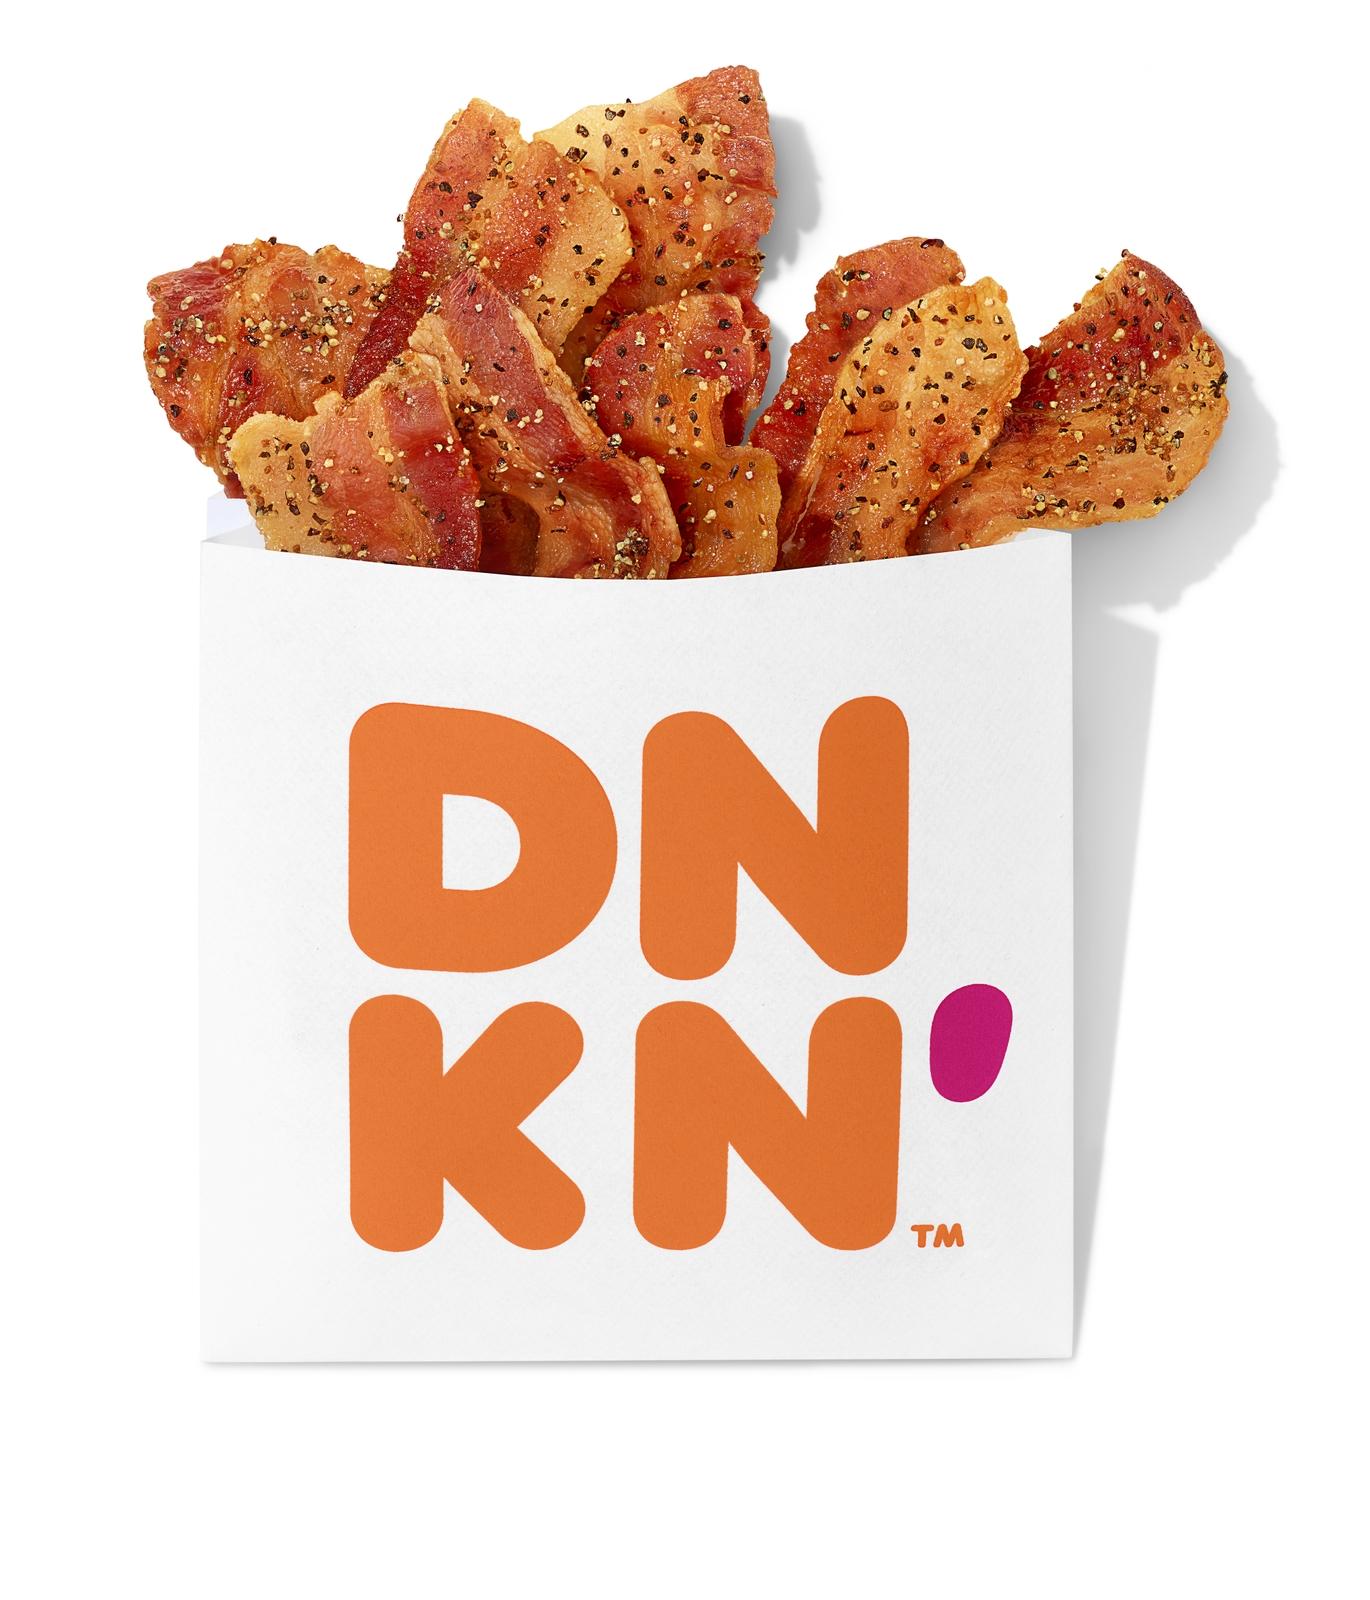 Sack the Sad Snacks with Dunkin's New Snackin' Bacon